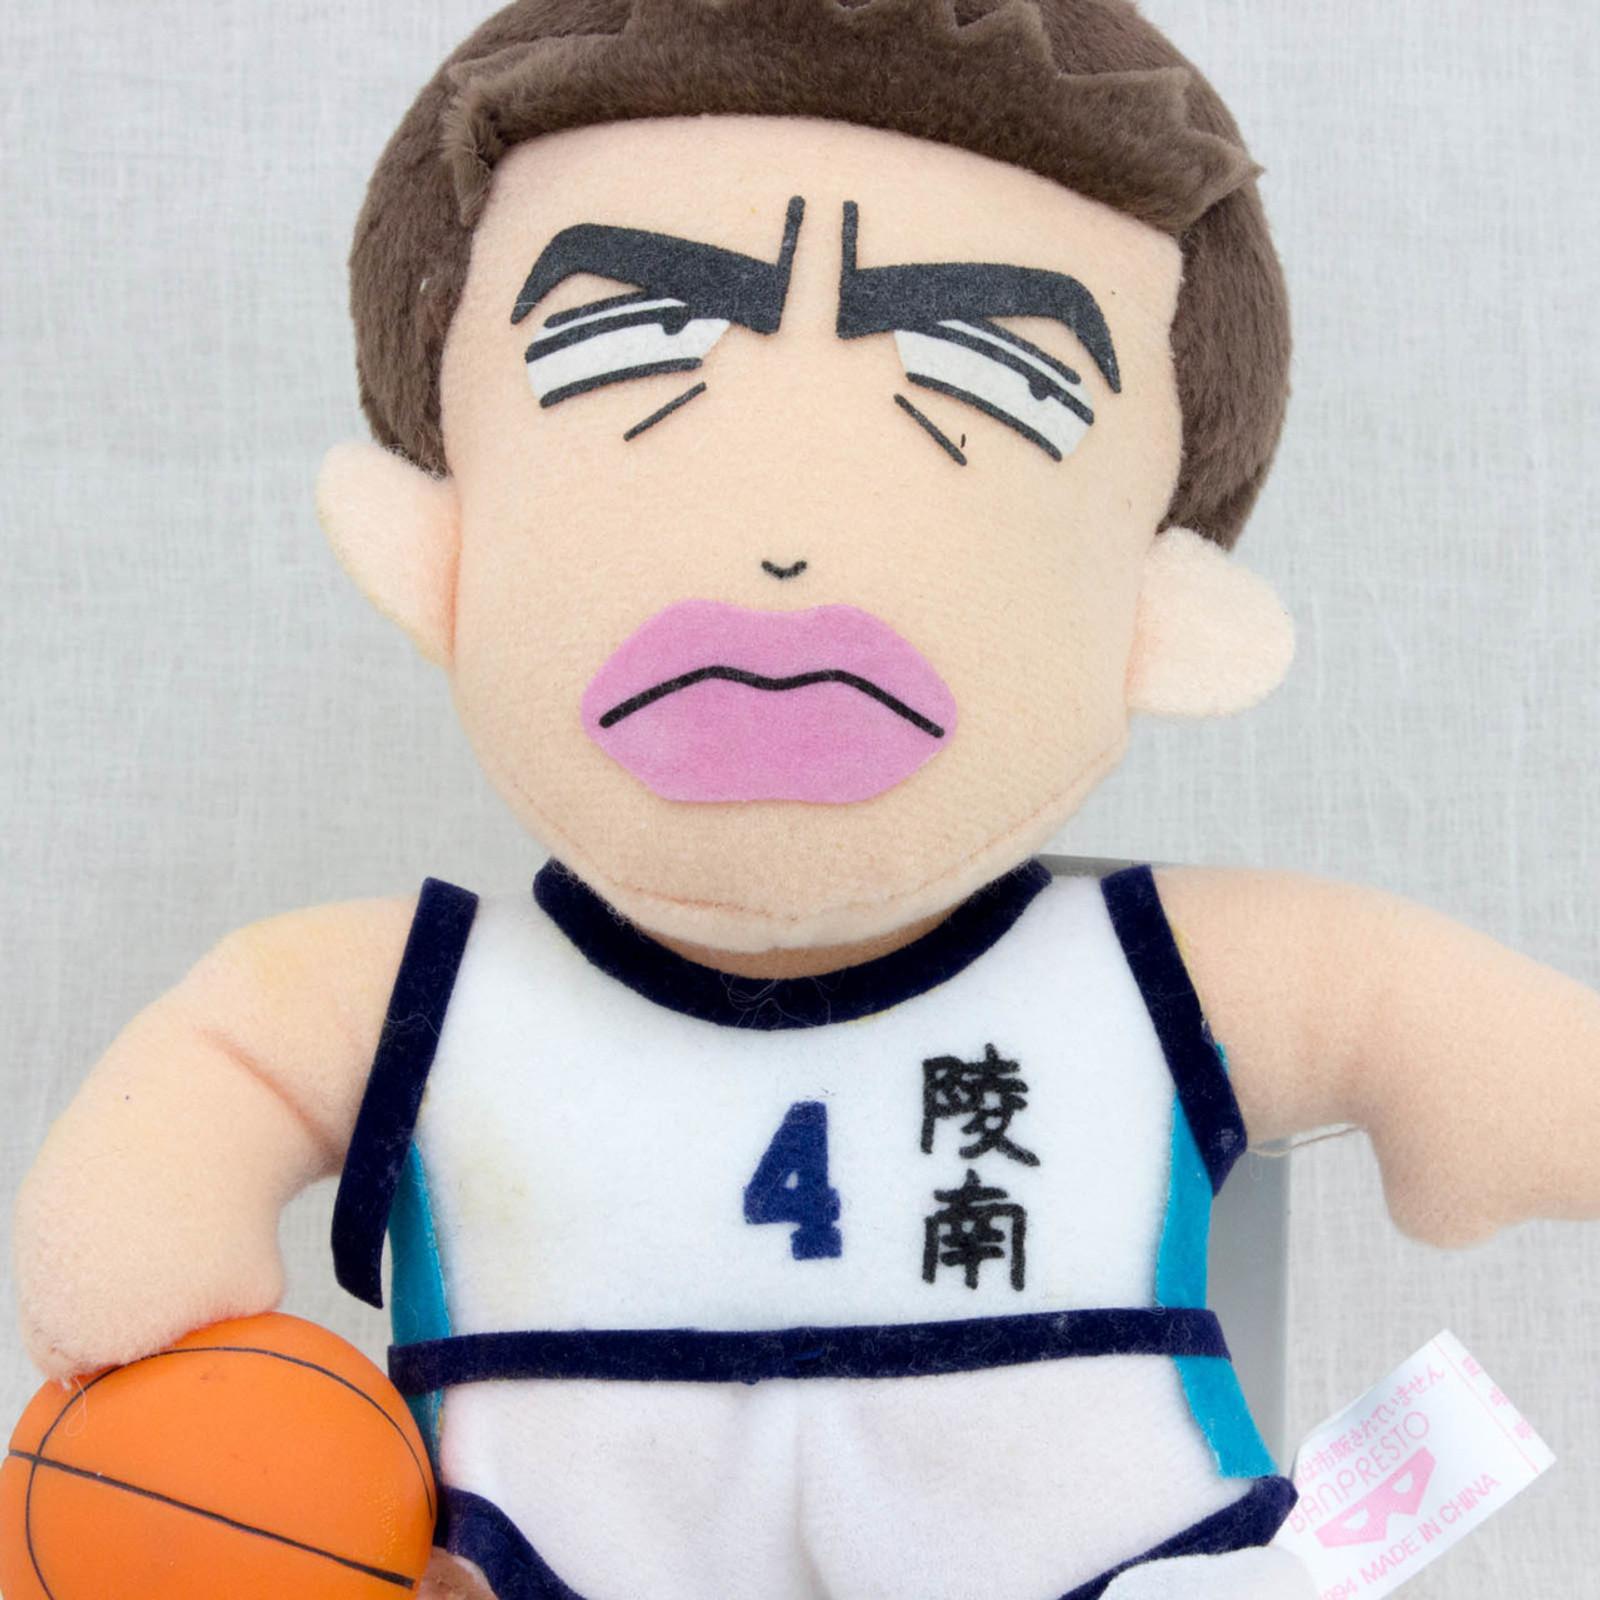 SLAM DUNK Jun Uozumi Ryonan #4 Plush Doll JAPAN ANIME MANGA JUMP